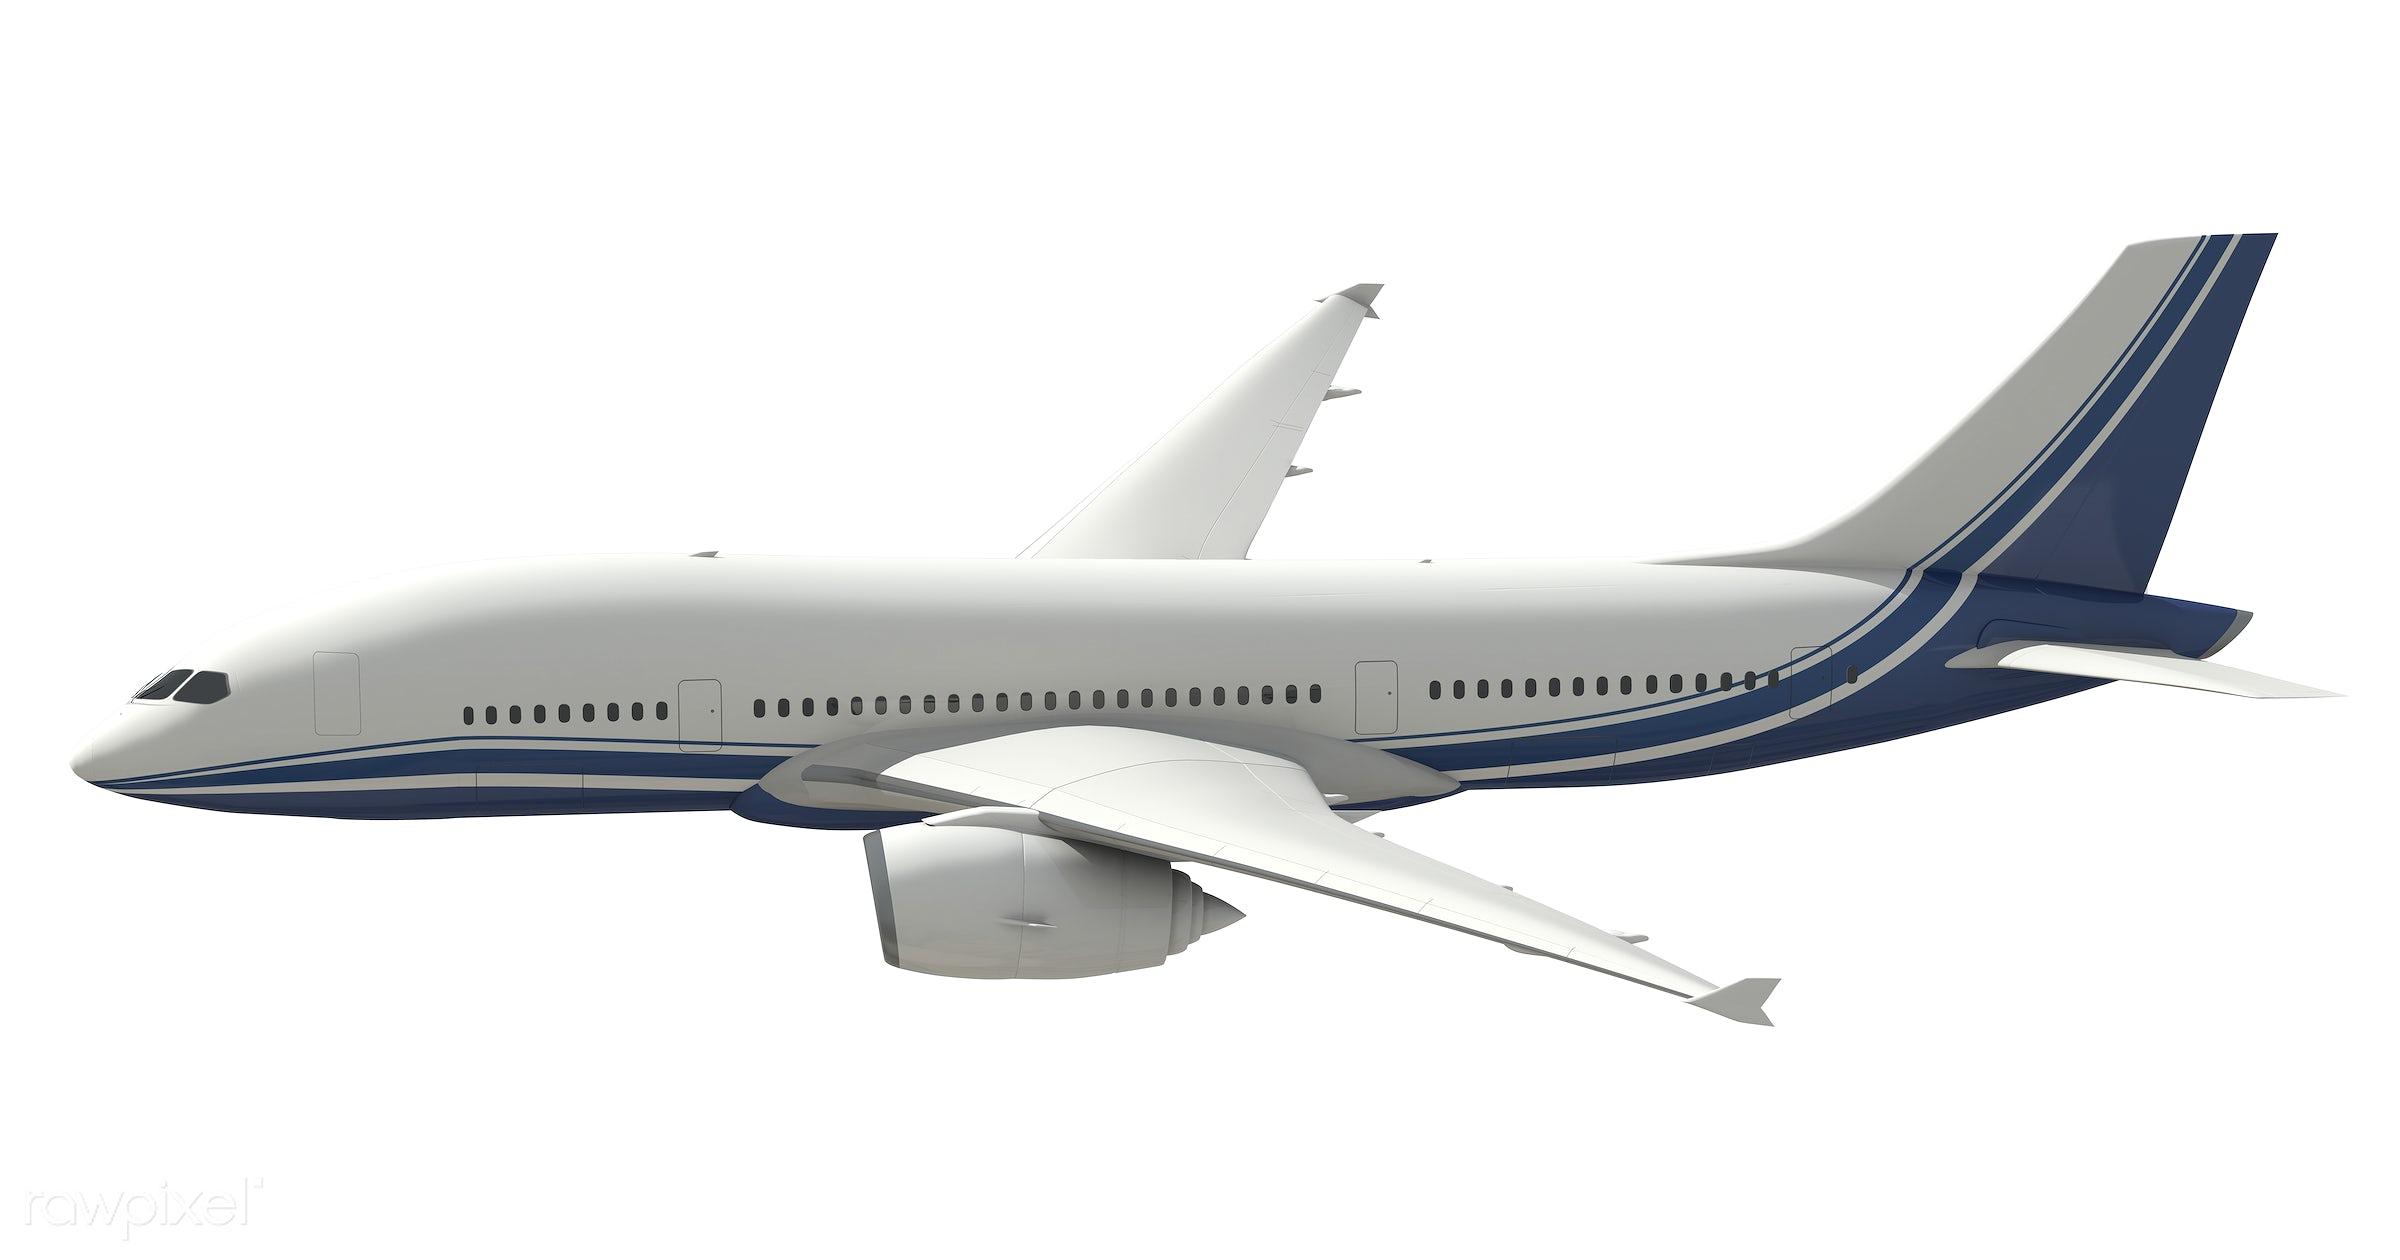 Three dimensional image of an airplane - airplane, plane, 3d, aeroplane, air vehicle, aircraft, airline, aviation,...